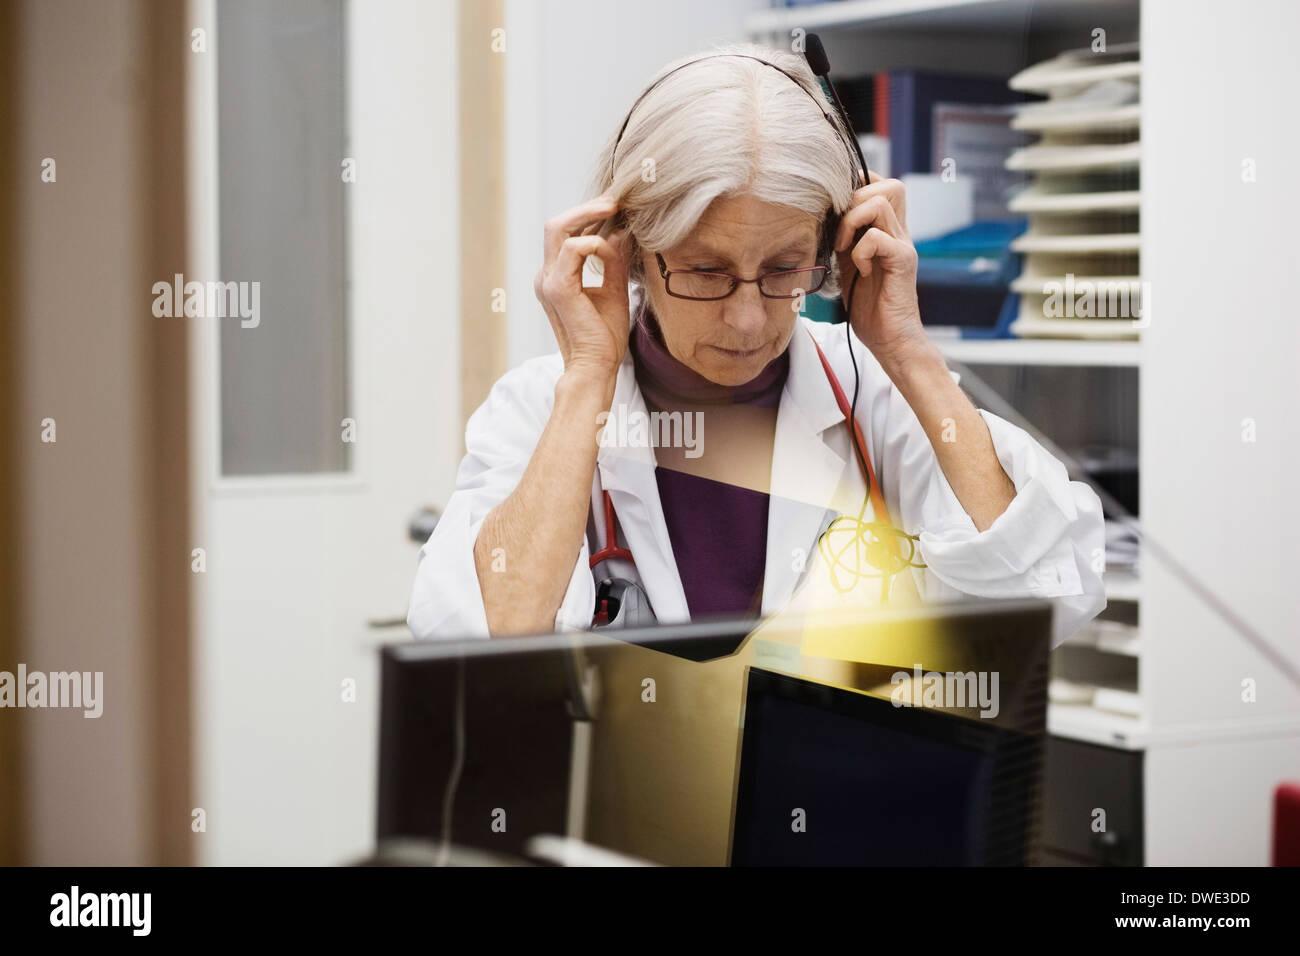 Senior female audiologist wearing headphones in examination room - Stock Image